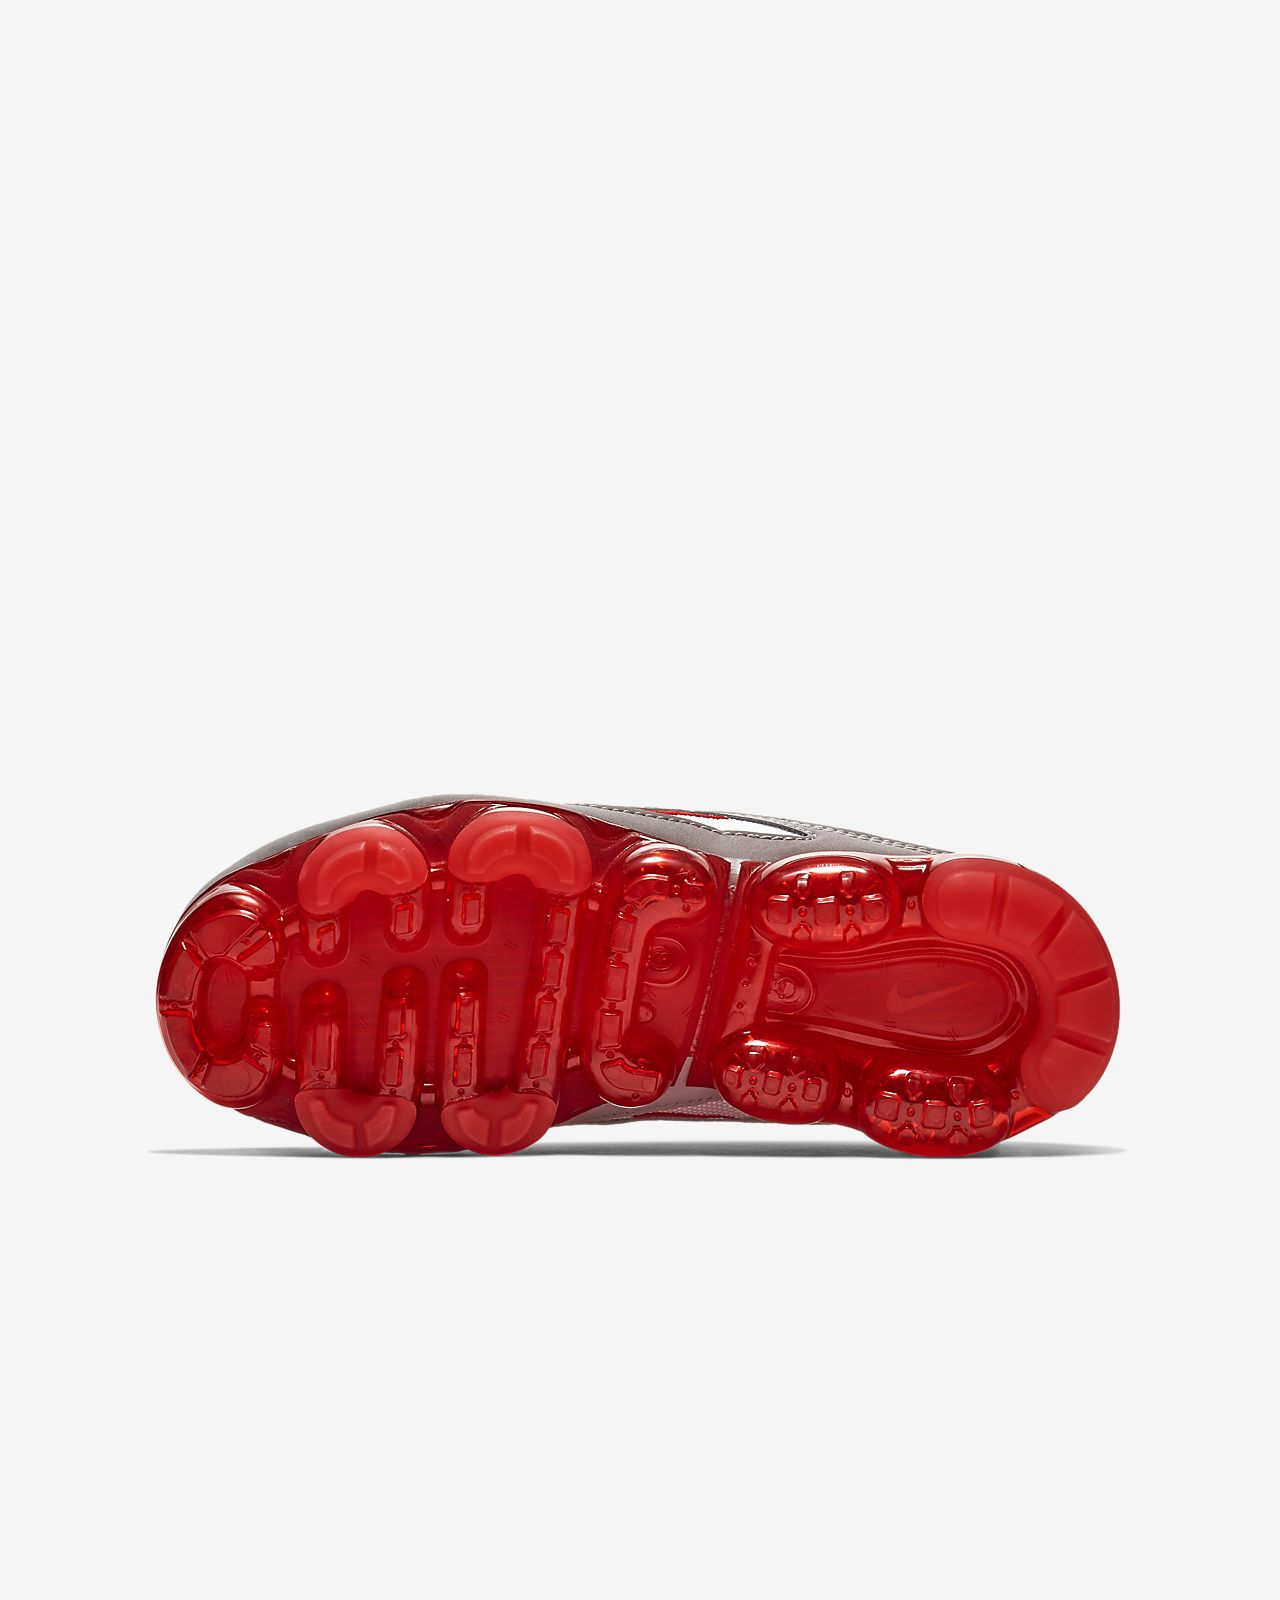 new styles 49bb8 8201c ... Nike Air VaporMax 97 Big Kids  Shoe